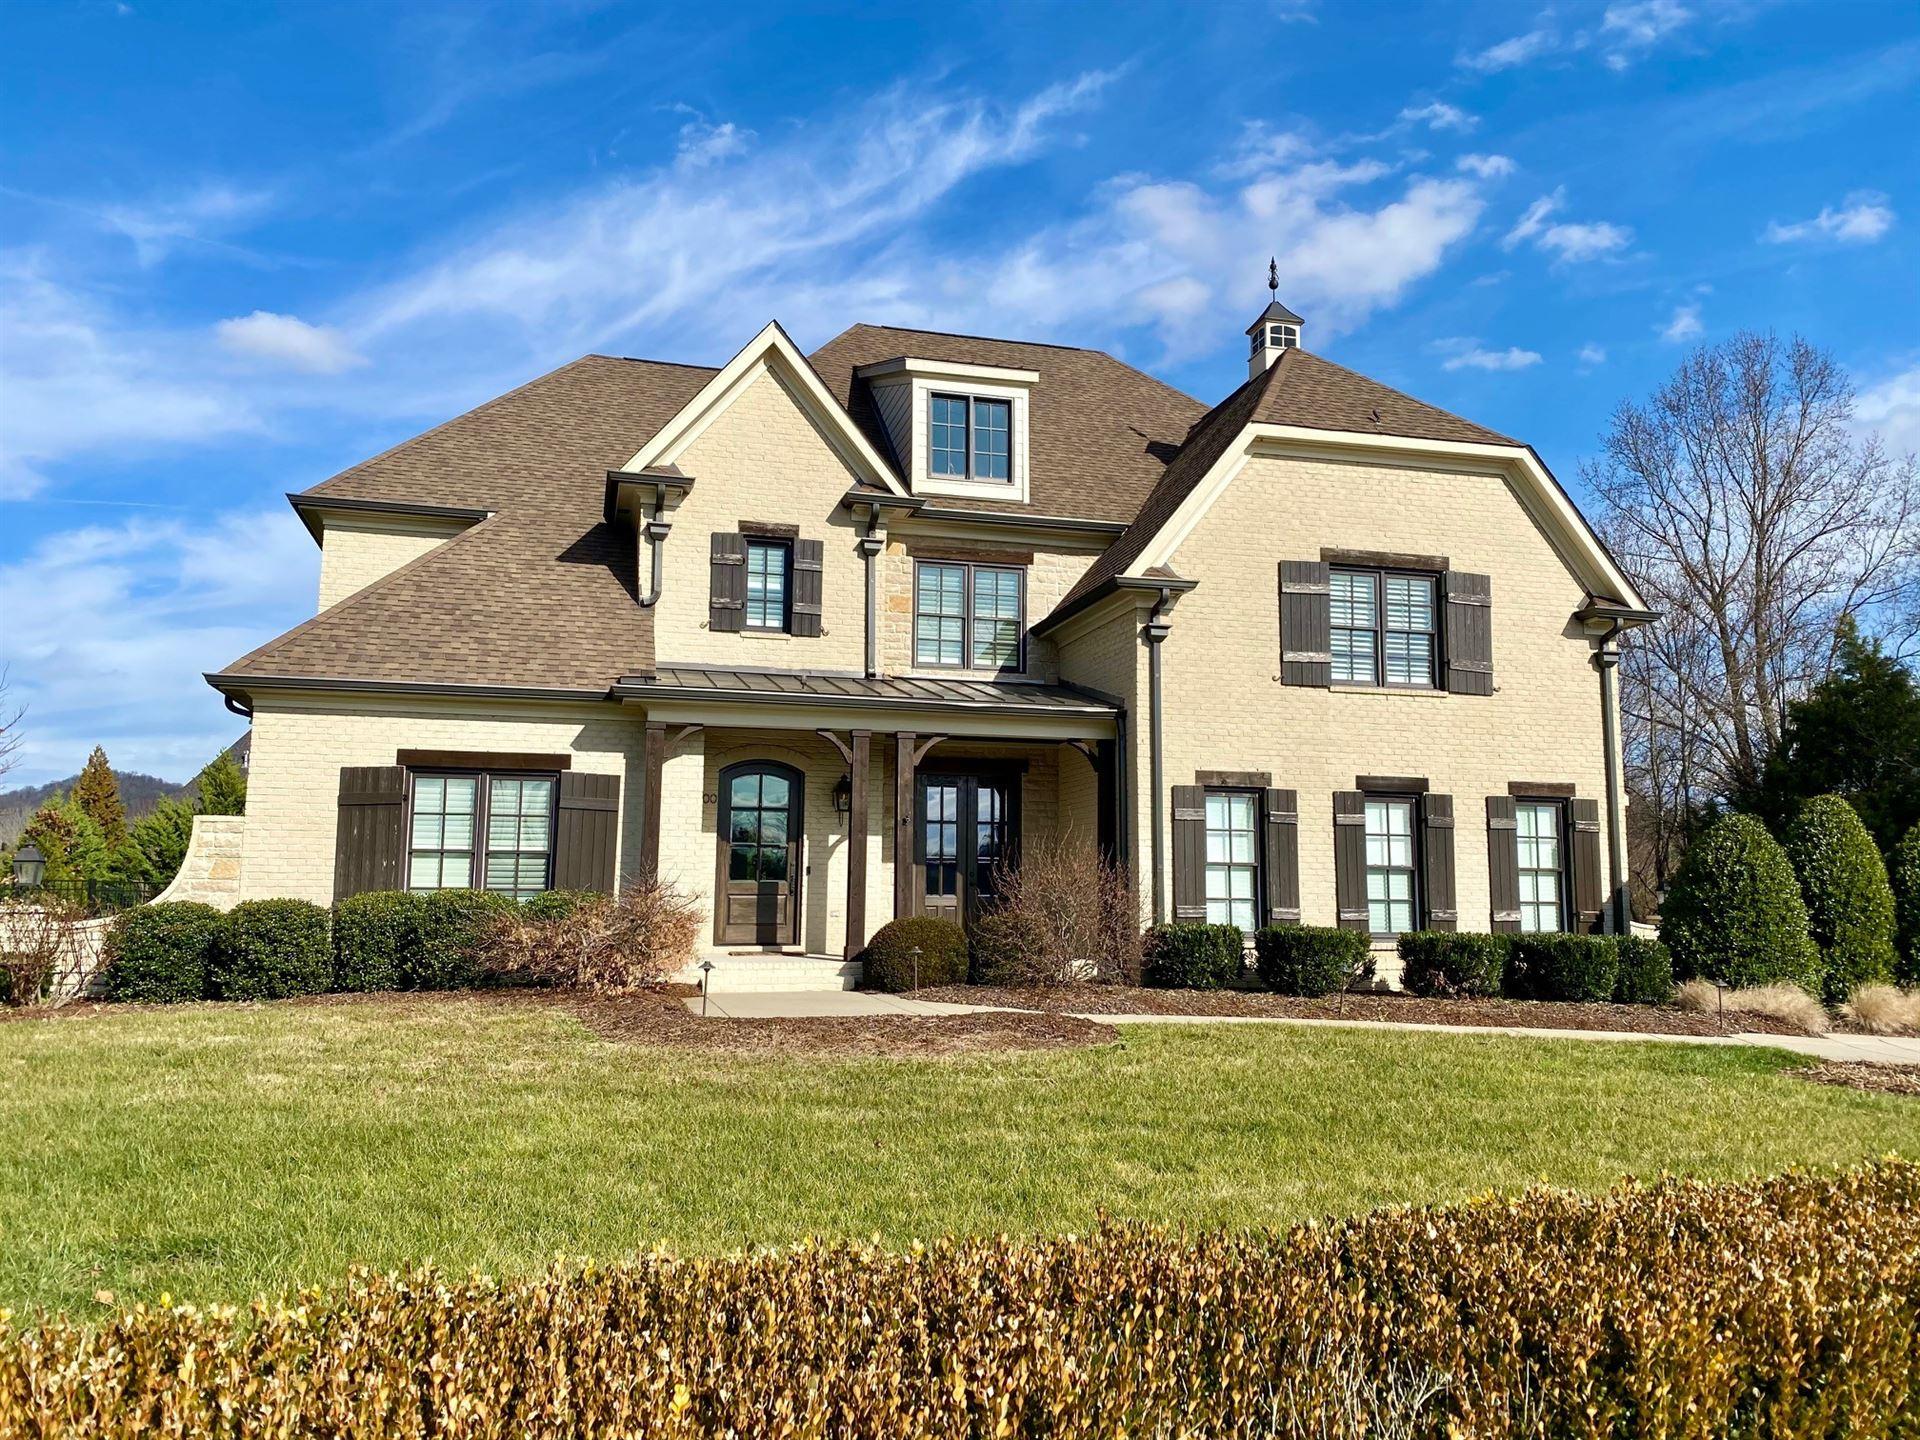 400 Ernest Rice Lane, Franklin, TN 37069 - MLS#: 2217237